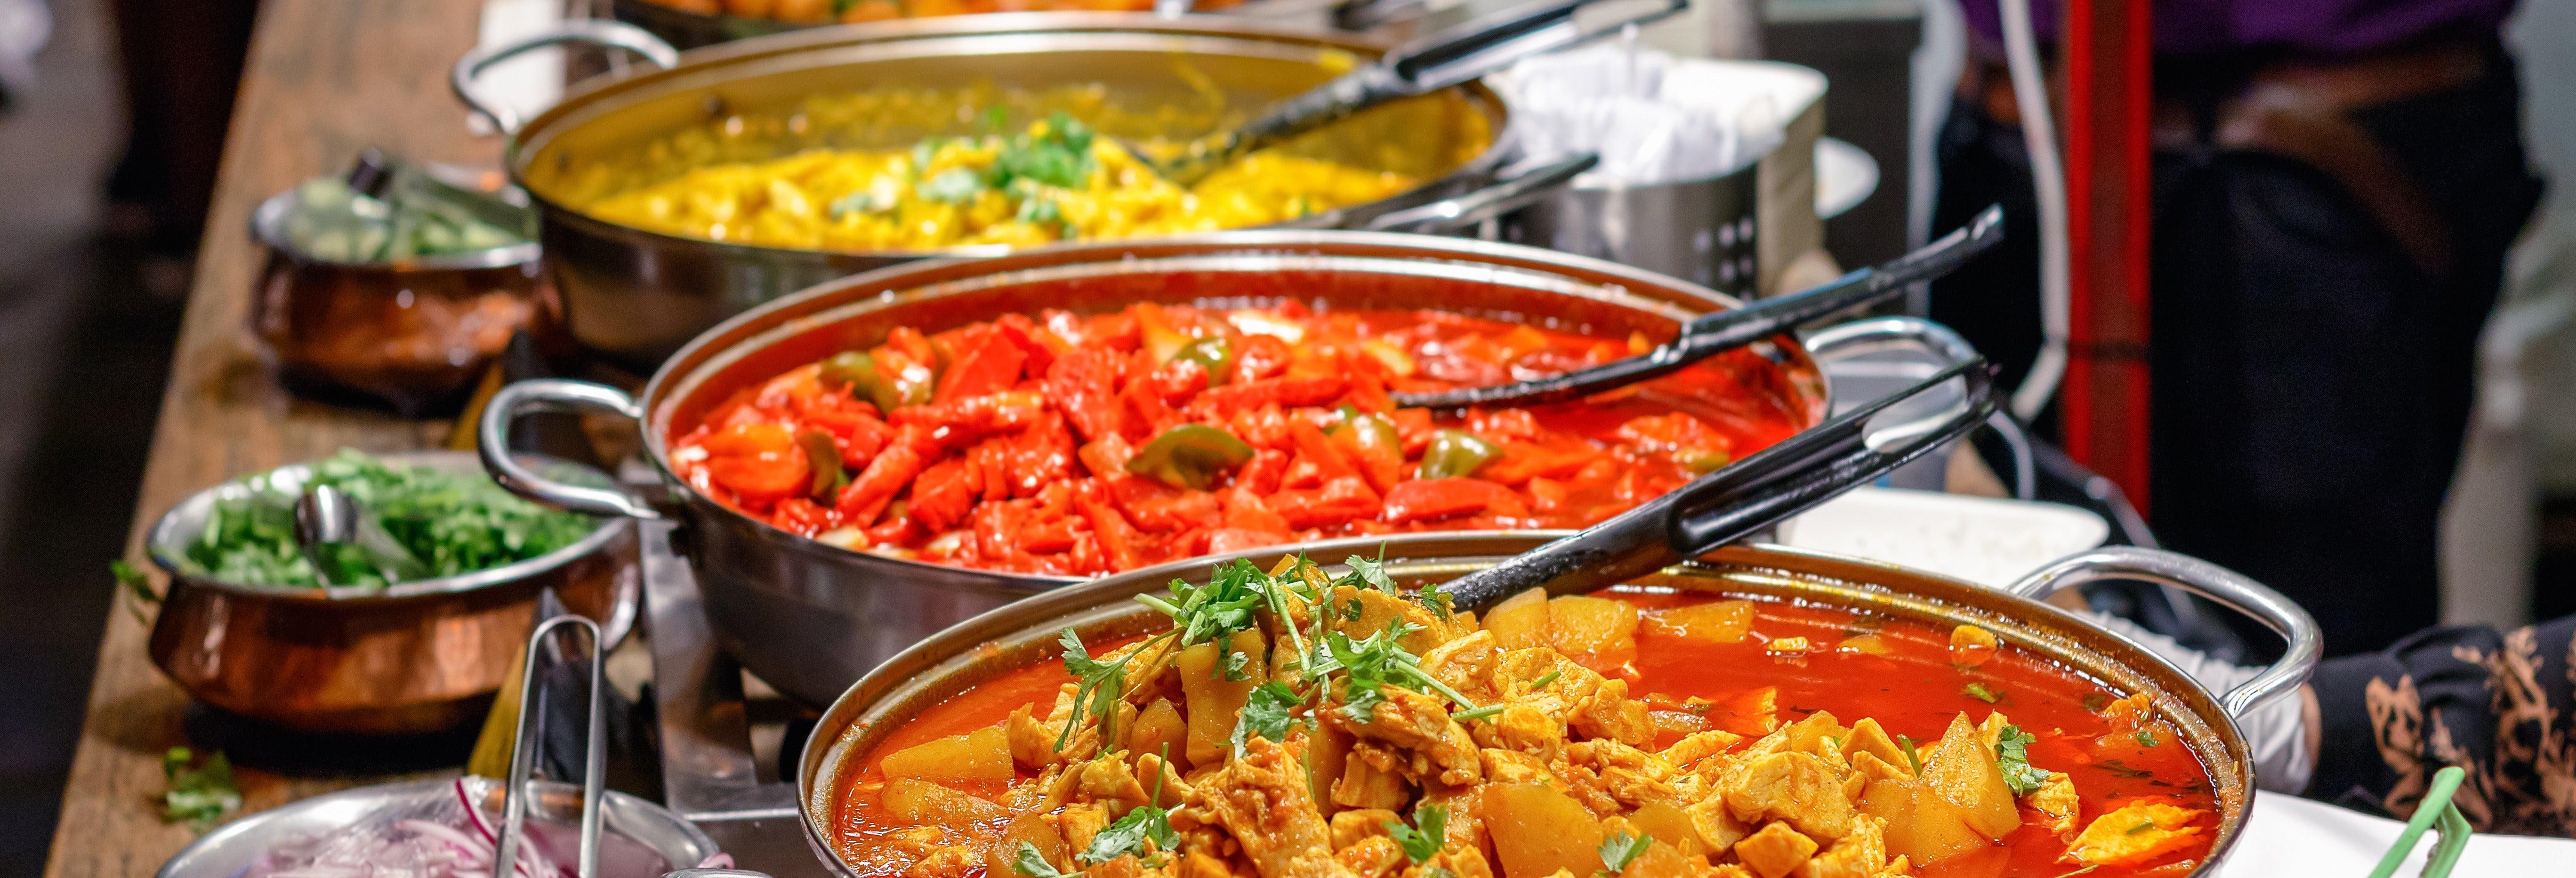 Tour gastronômico por Jodhpur